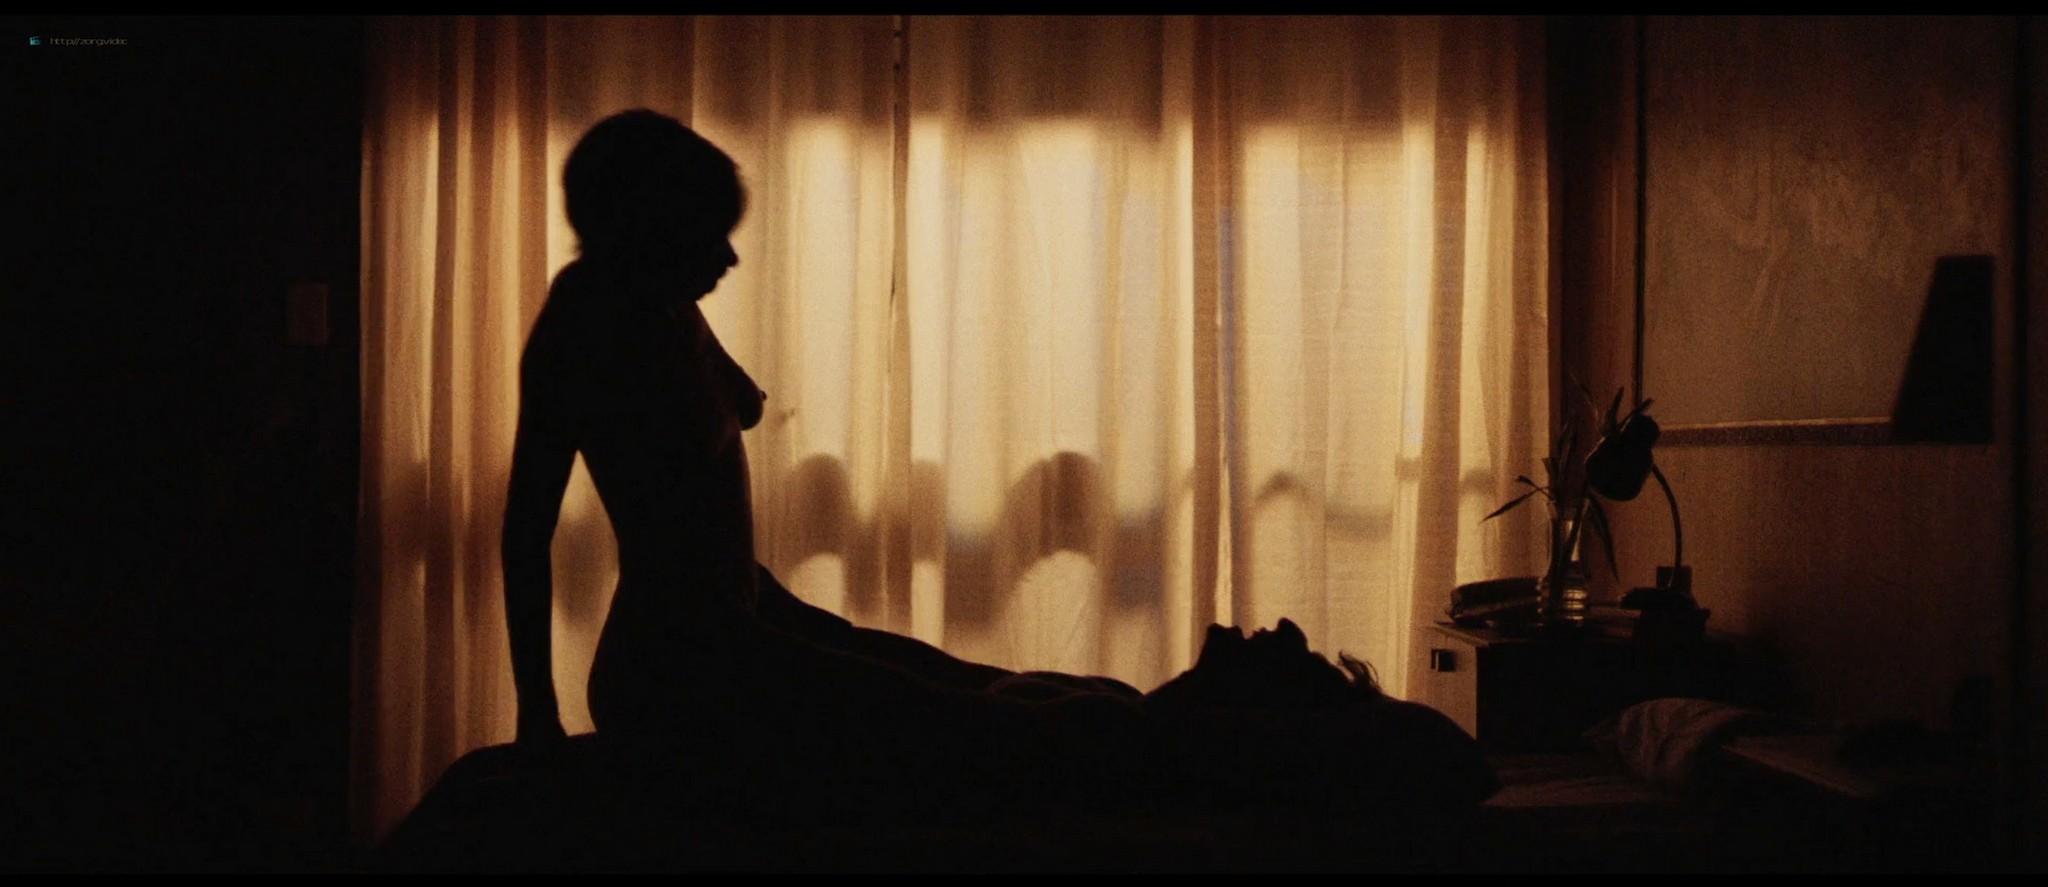 Julianne Nicholson nude sex Sabrina Alfonso nude too - Initials SG (AR-2019) HD 1080p Web (15)